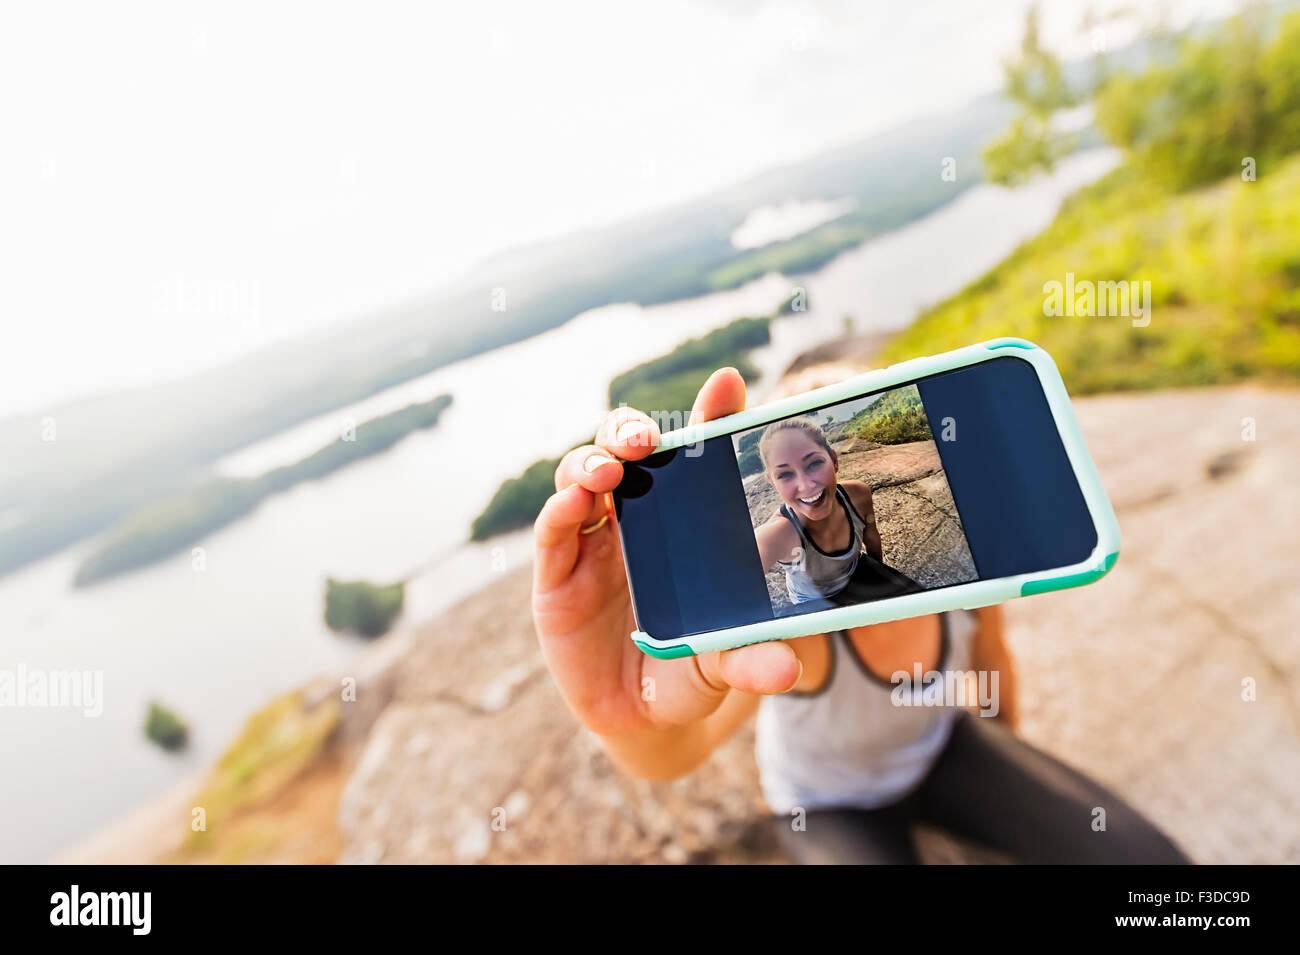 Jeune femme prenant sur Smartphone selfies Photo Stock